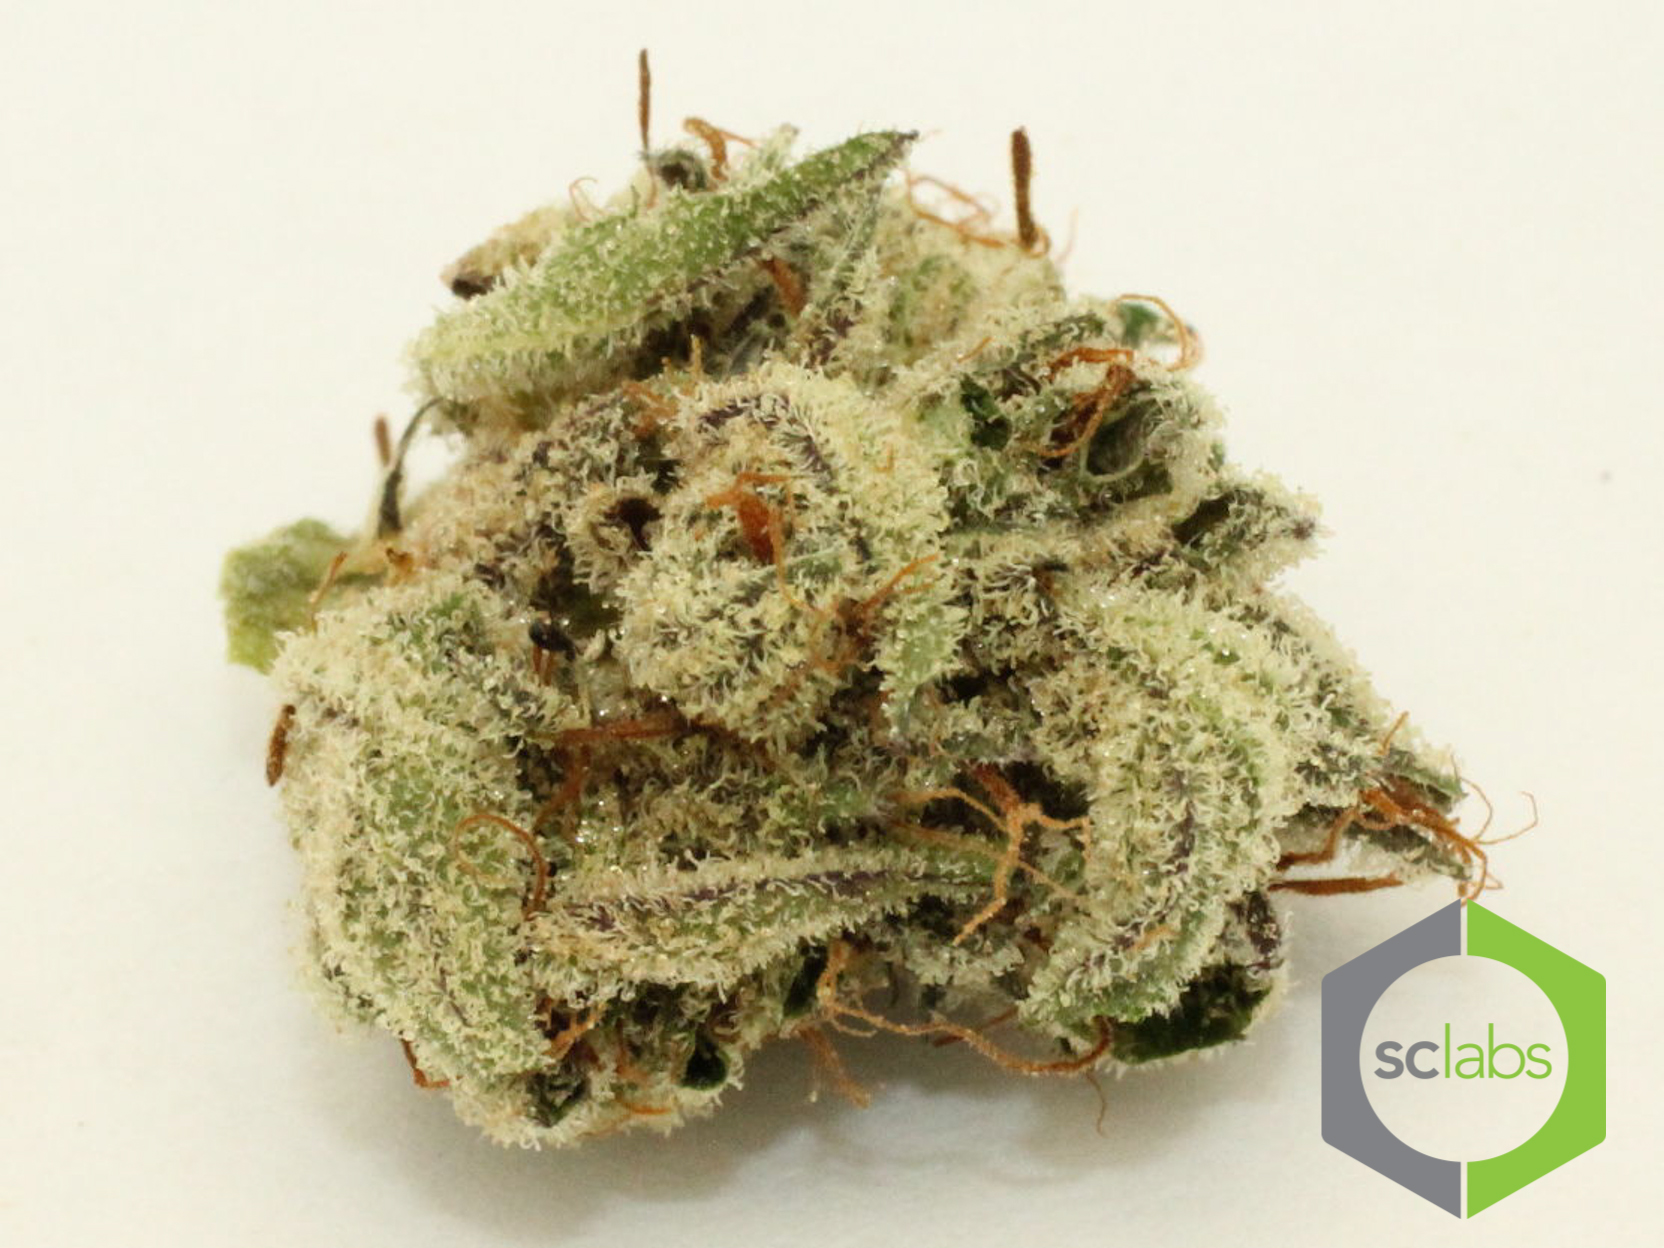 u2-og-weed-ocpc